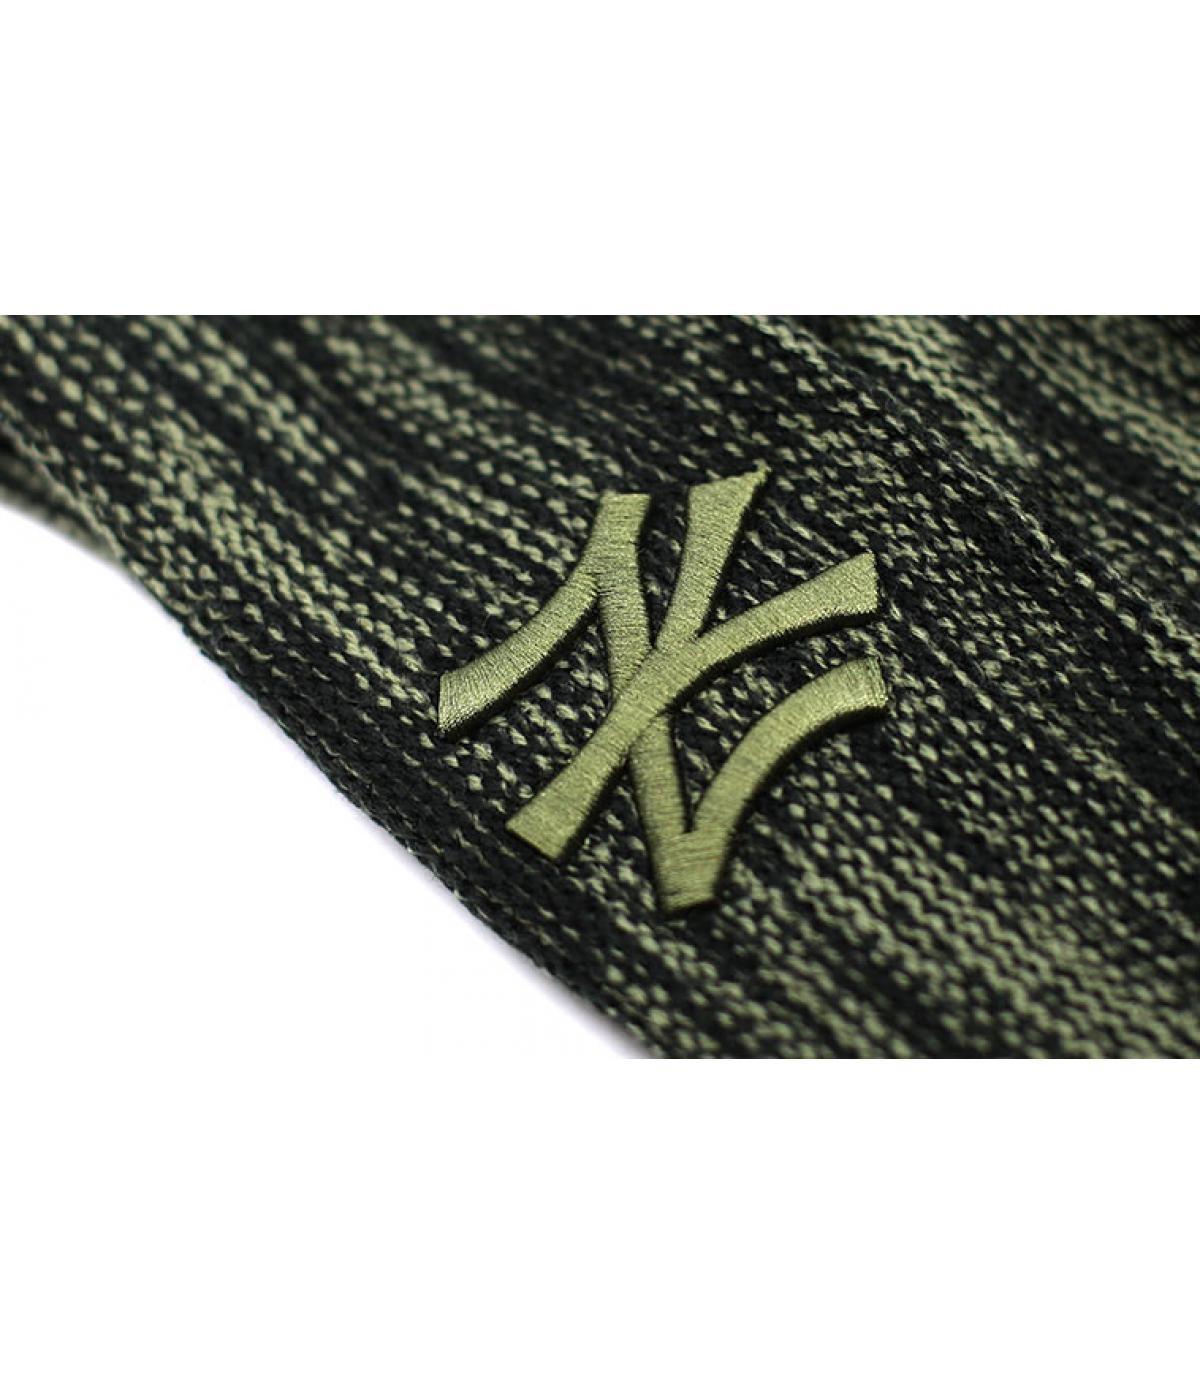 Détails NY Marl Knit black Olive - image 3